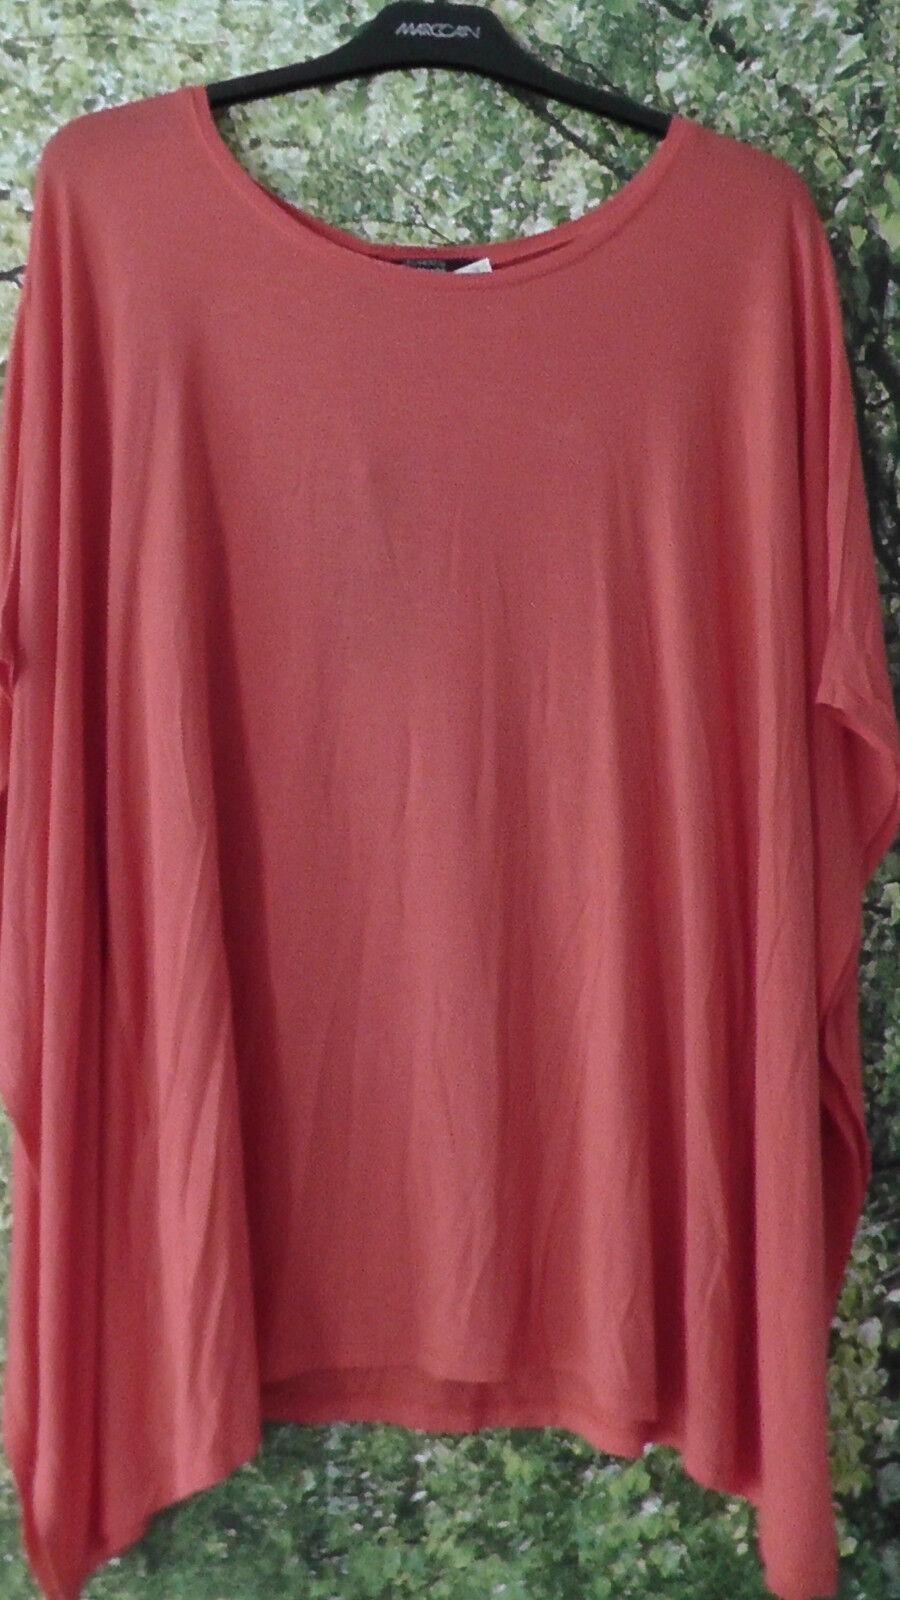 GUESS by MARCIANO Damen Shirt Größe 4 L 40 Koralle Viskosemischung